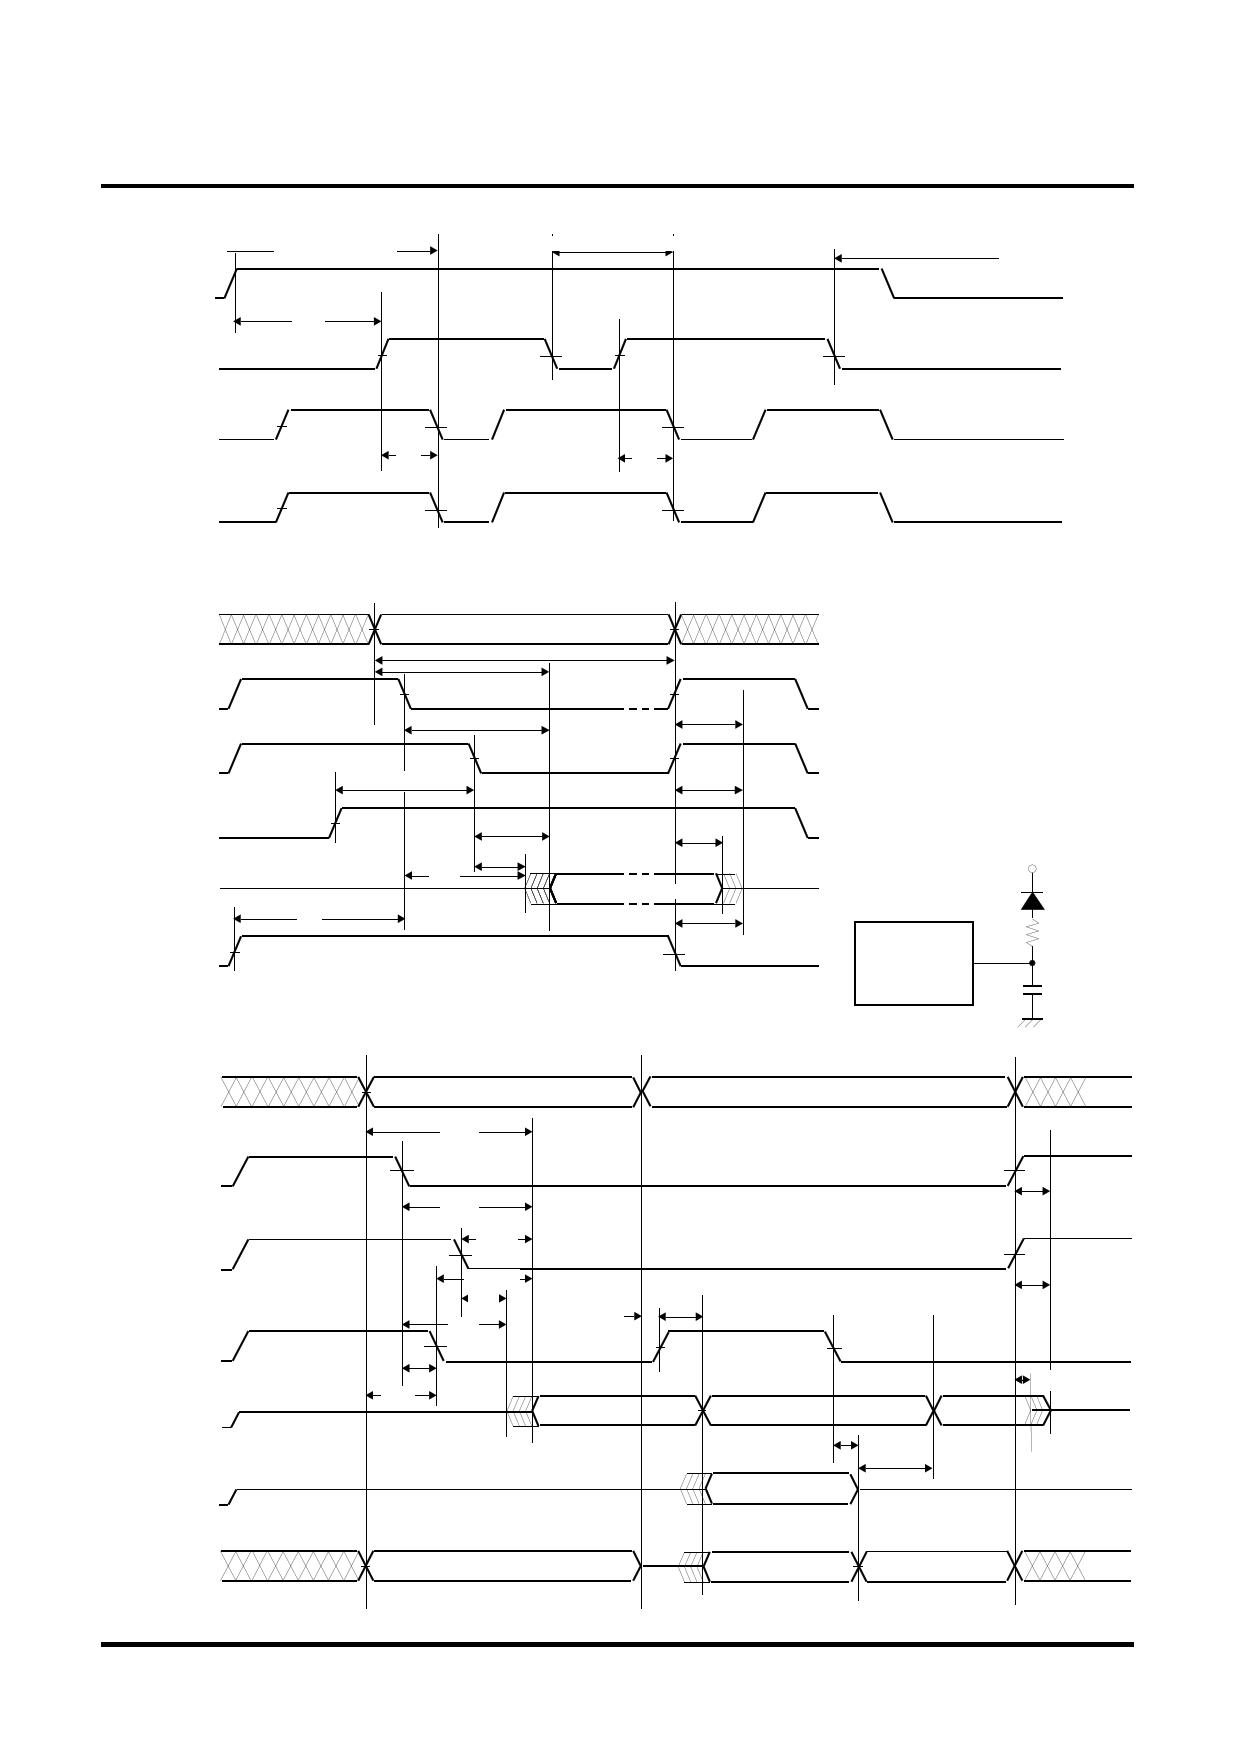 M5M29FT800VP-12 diode, scr